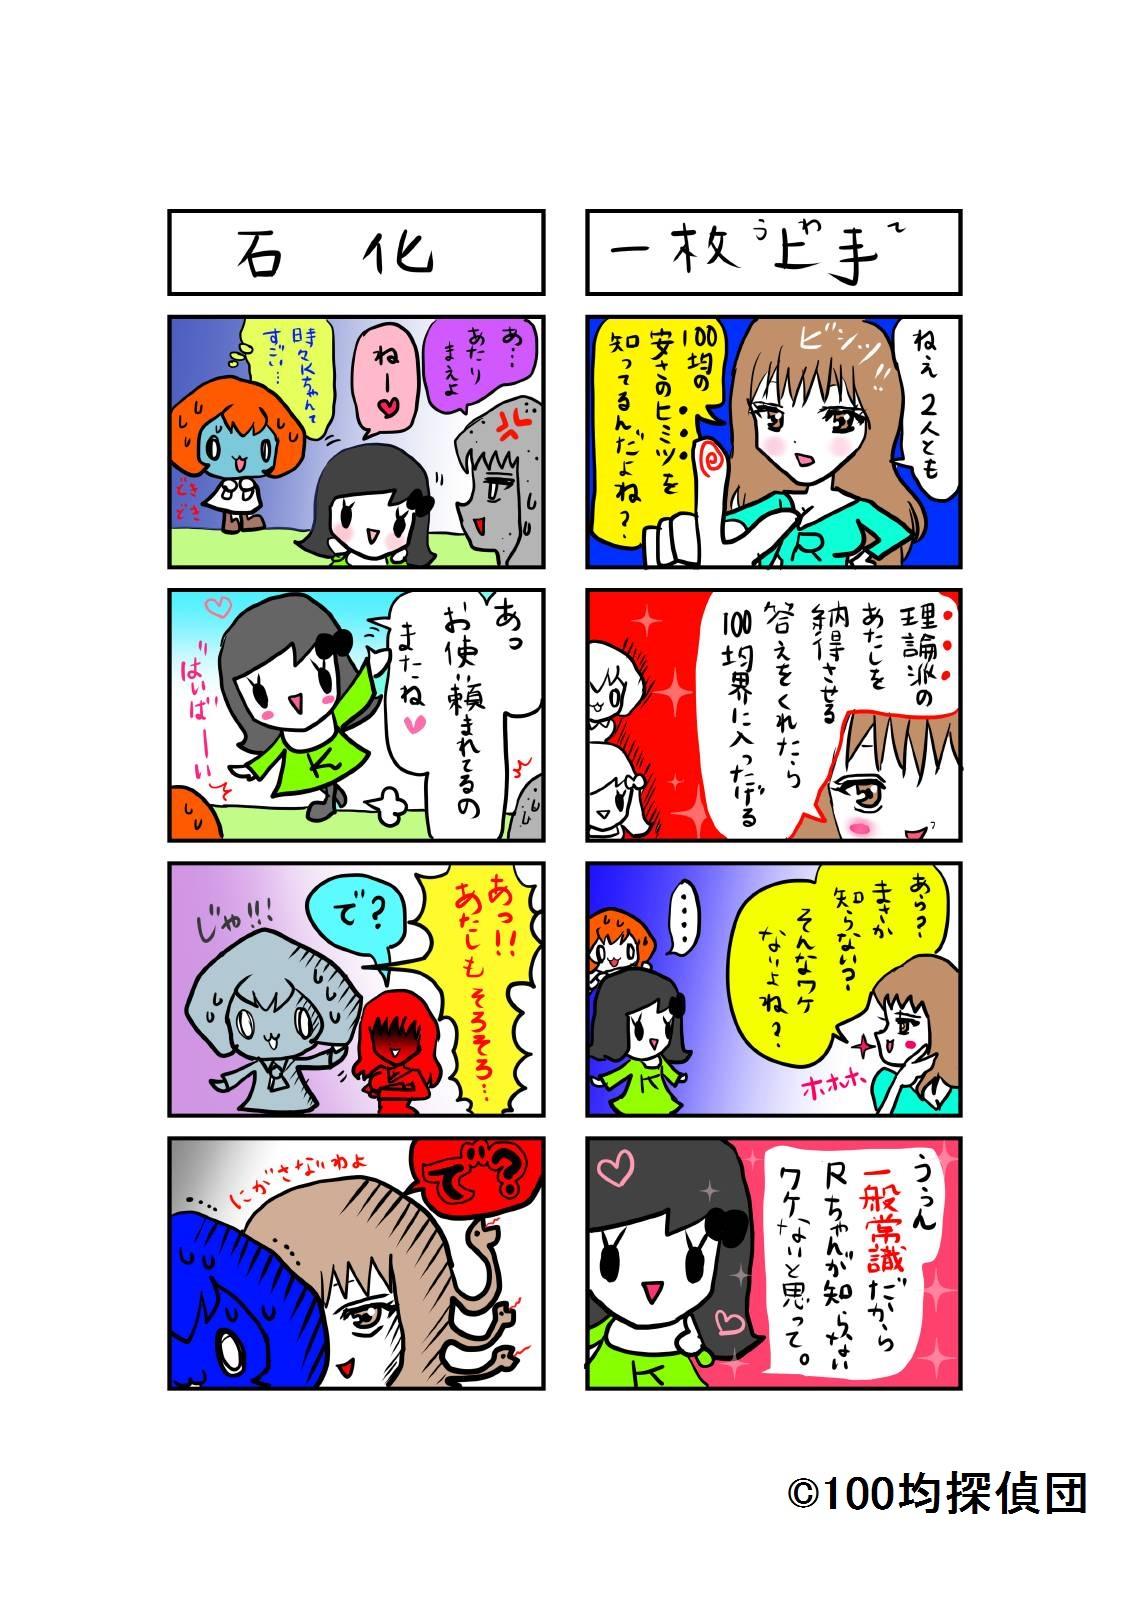 pict-35~36